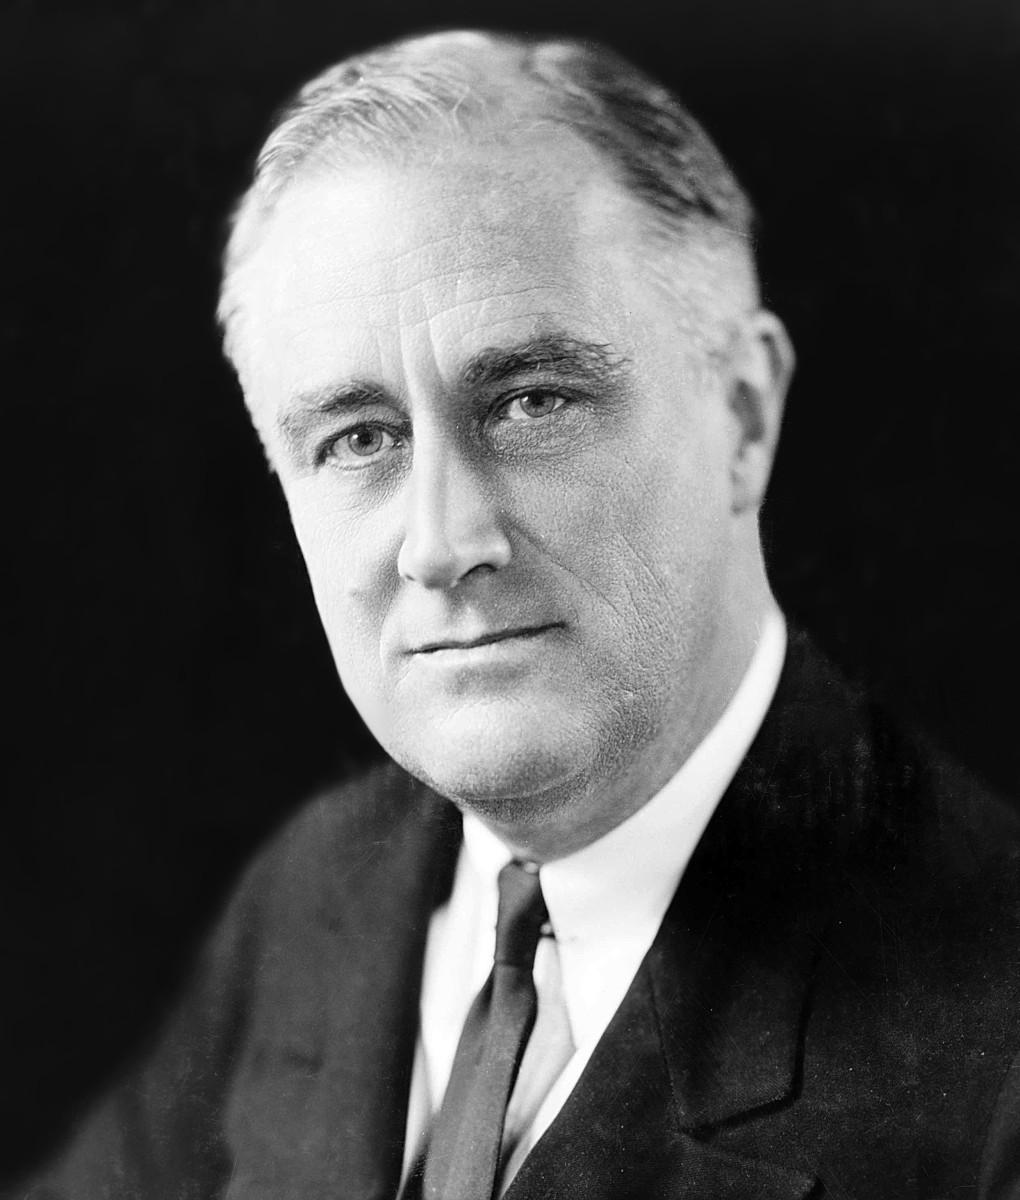 A photo portrait of Franklin Delano Roosevelt (1933)